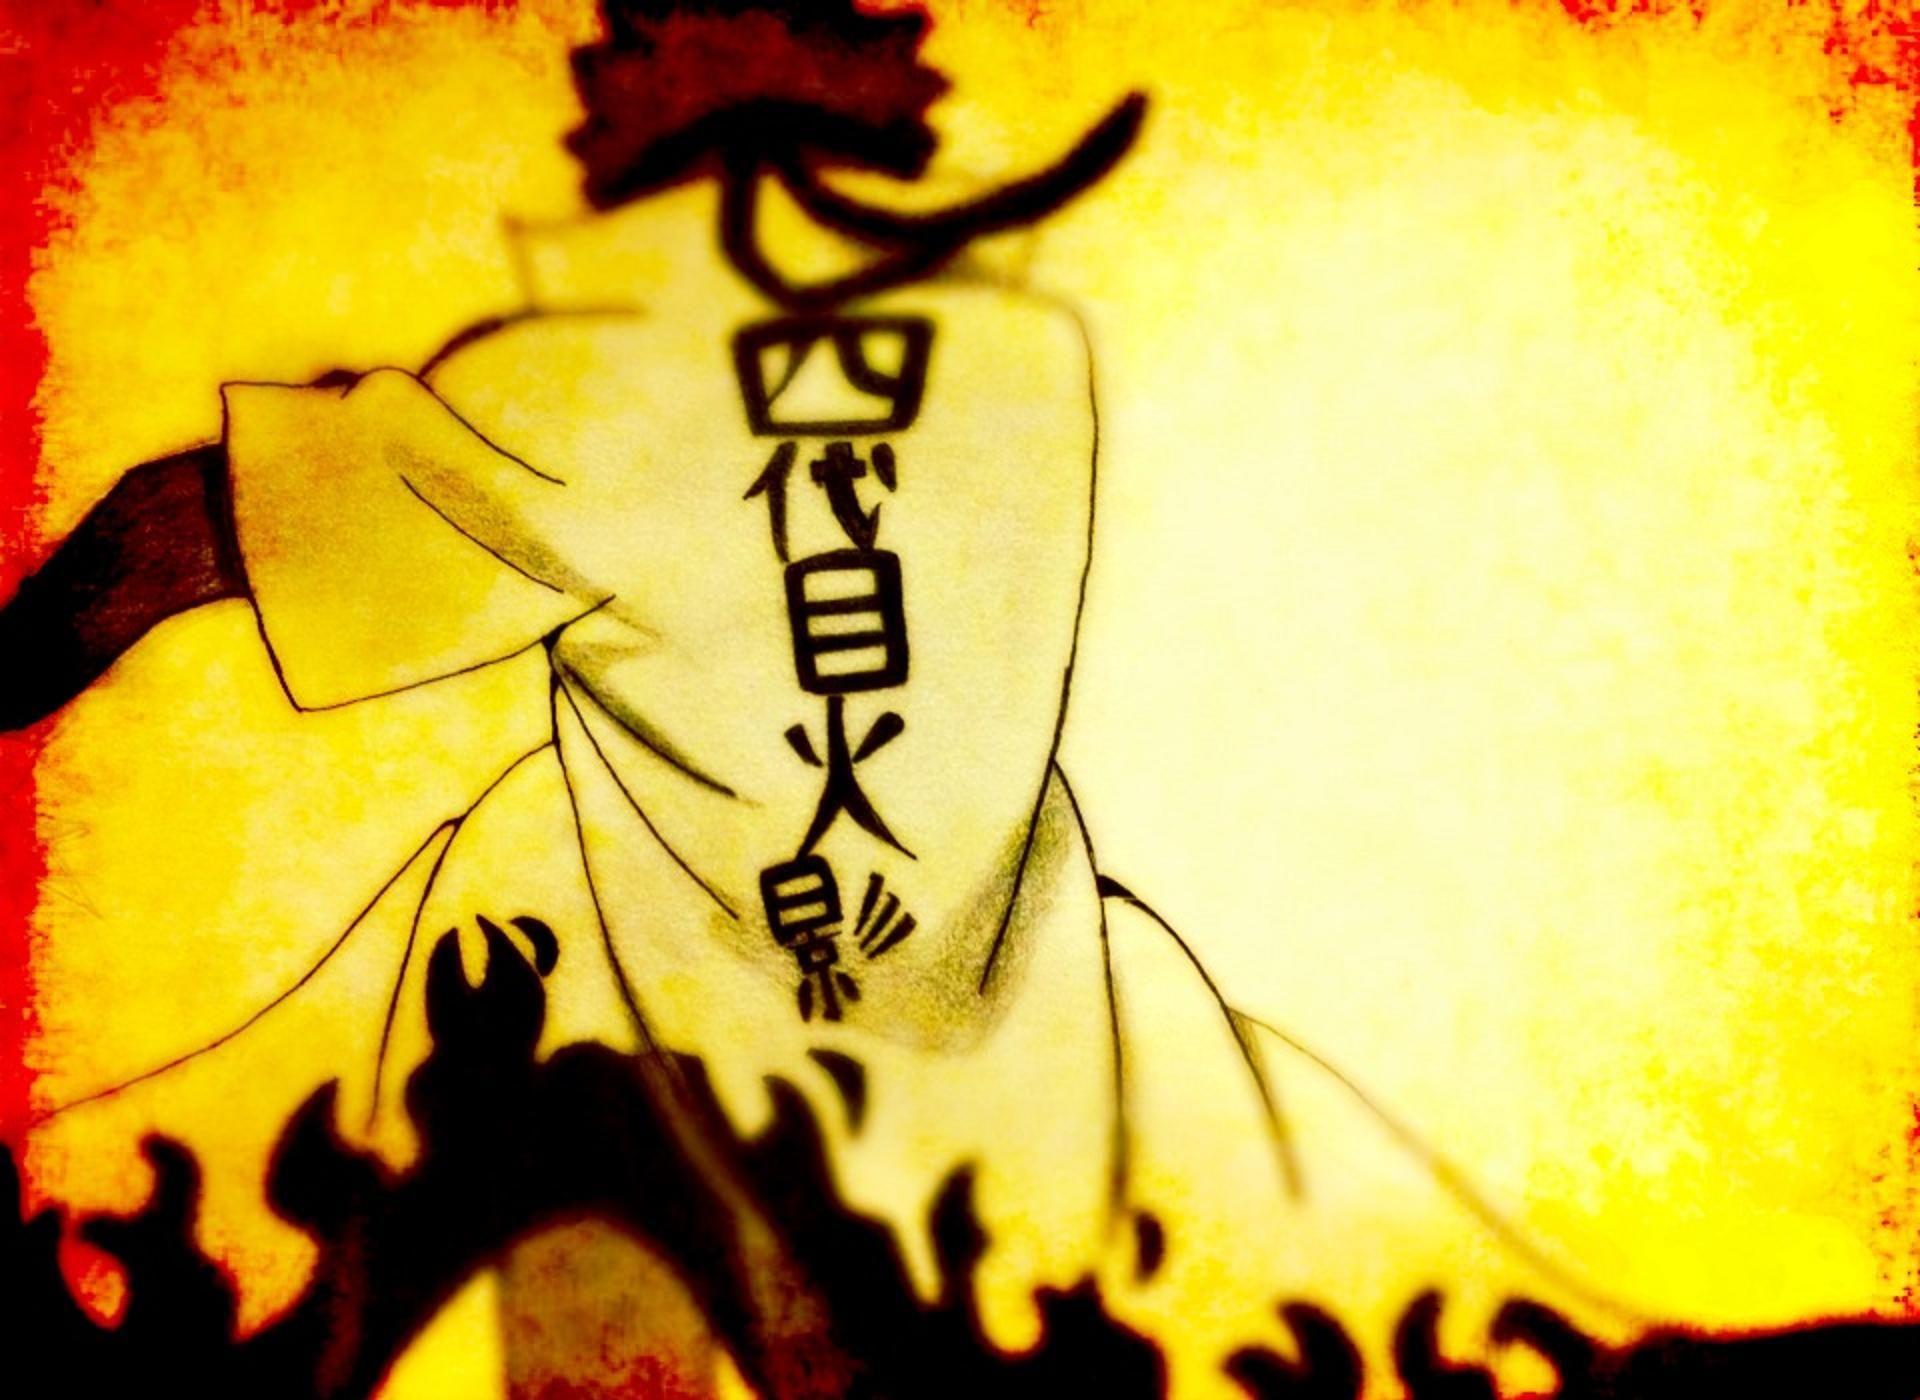 Good Wallpaper Naruto Yellow - 2dfa869ba0b508faf1f5a7f40f05f77d  Photograph.jpg